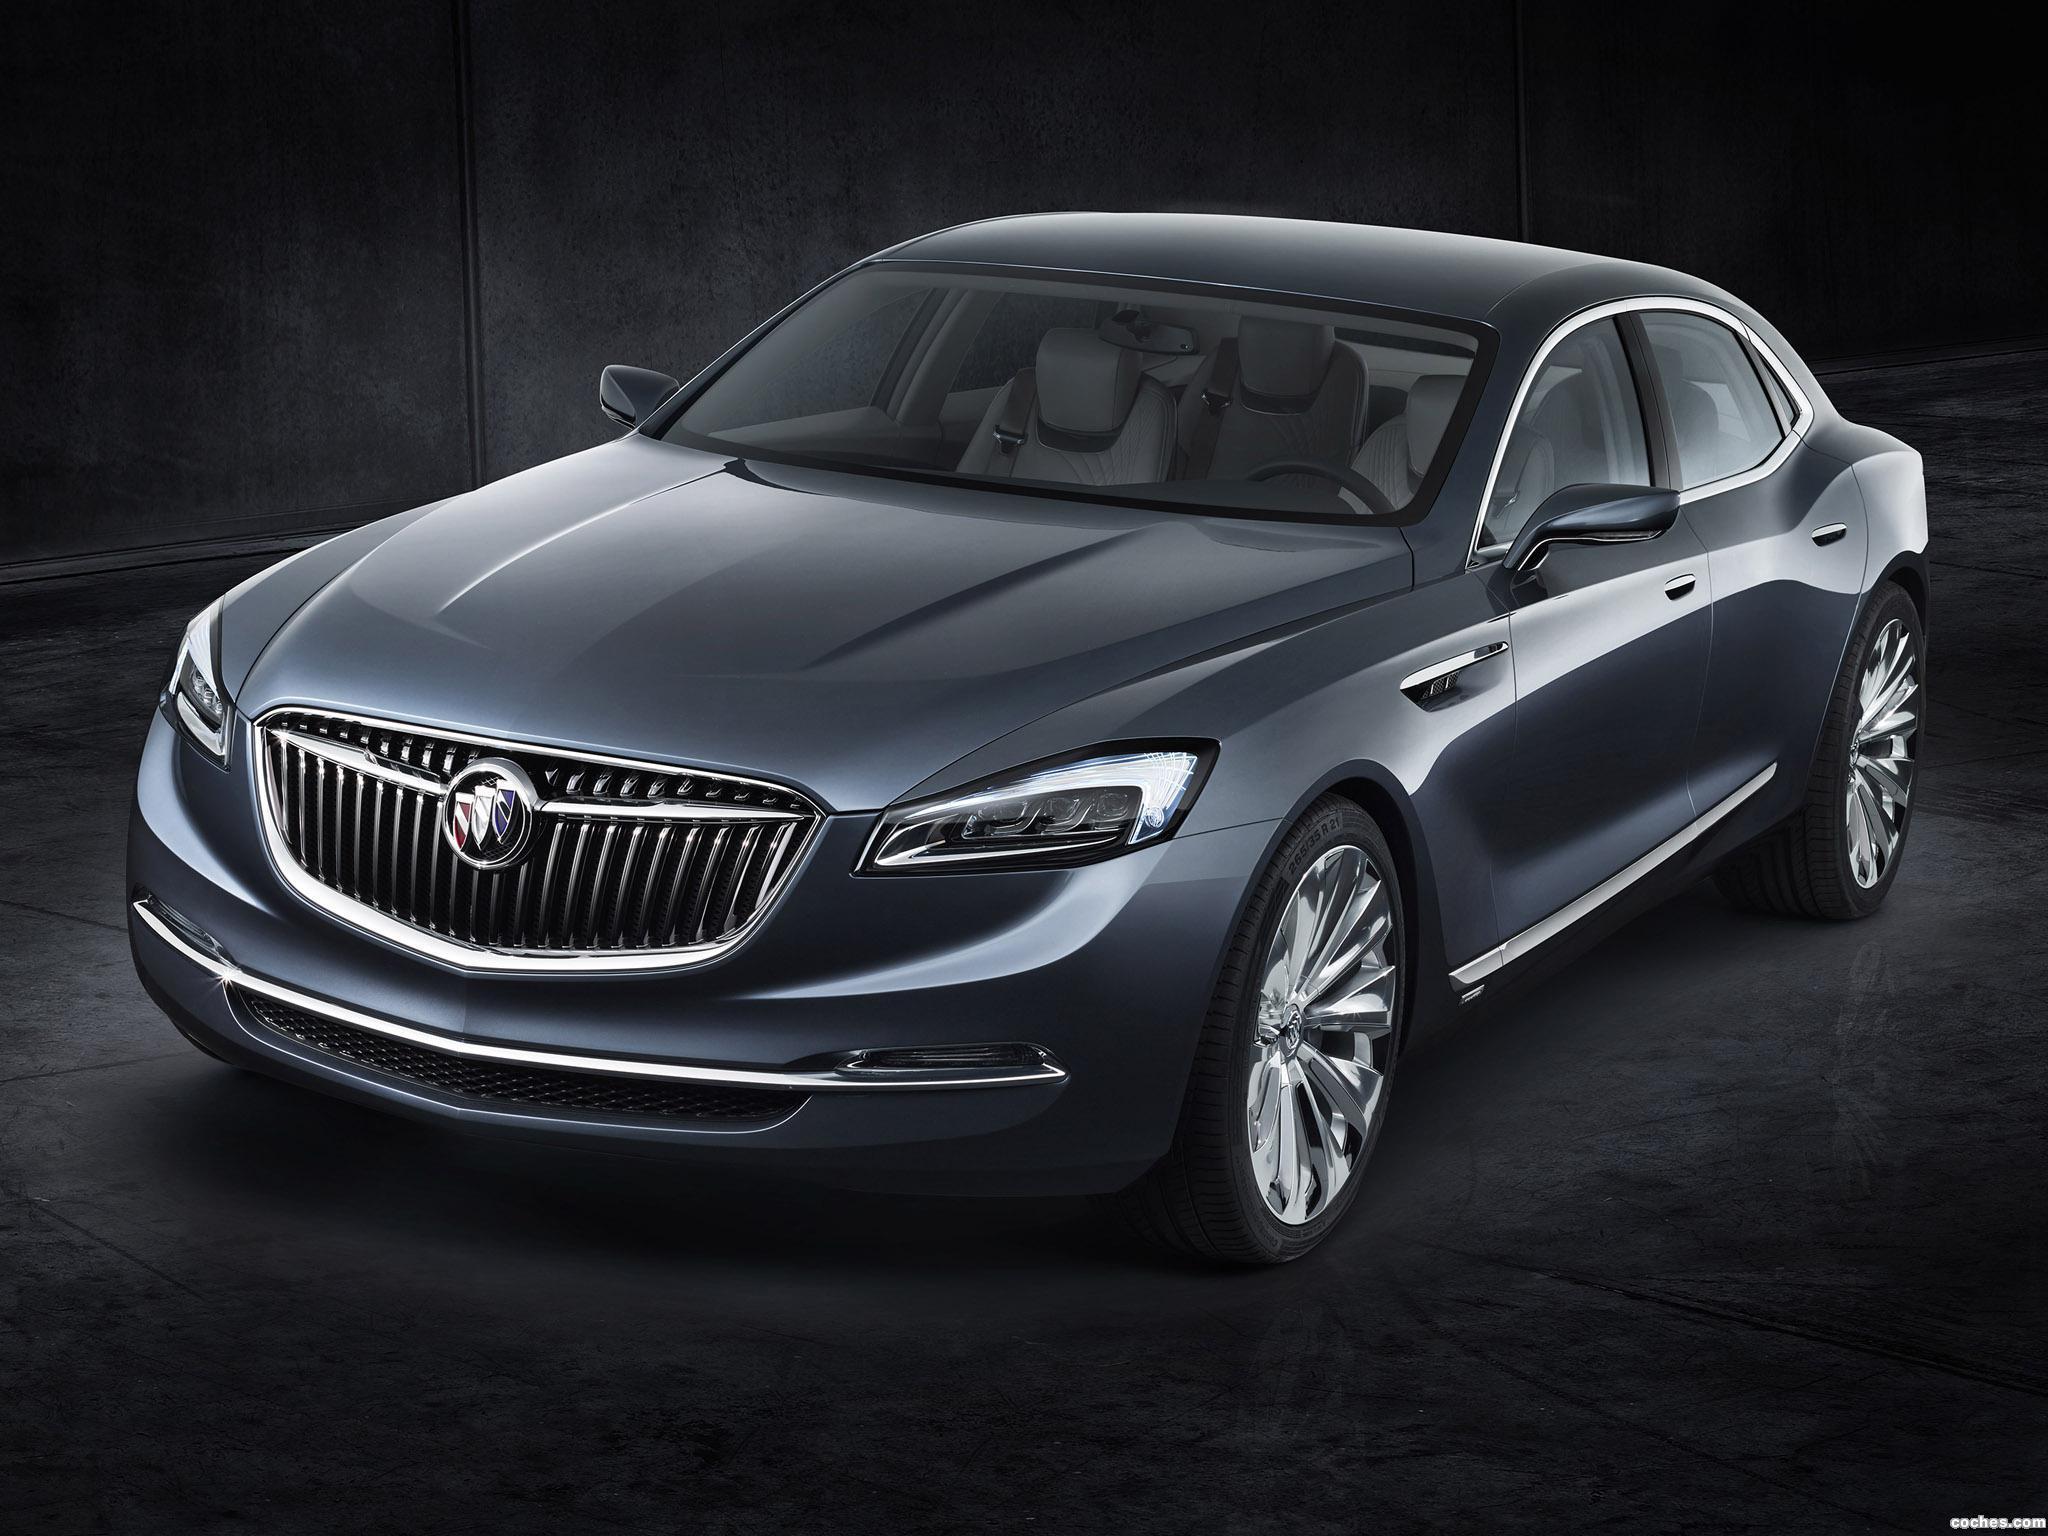 Foto 7 de Buick Avenir Concept 2015